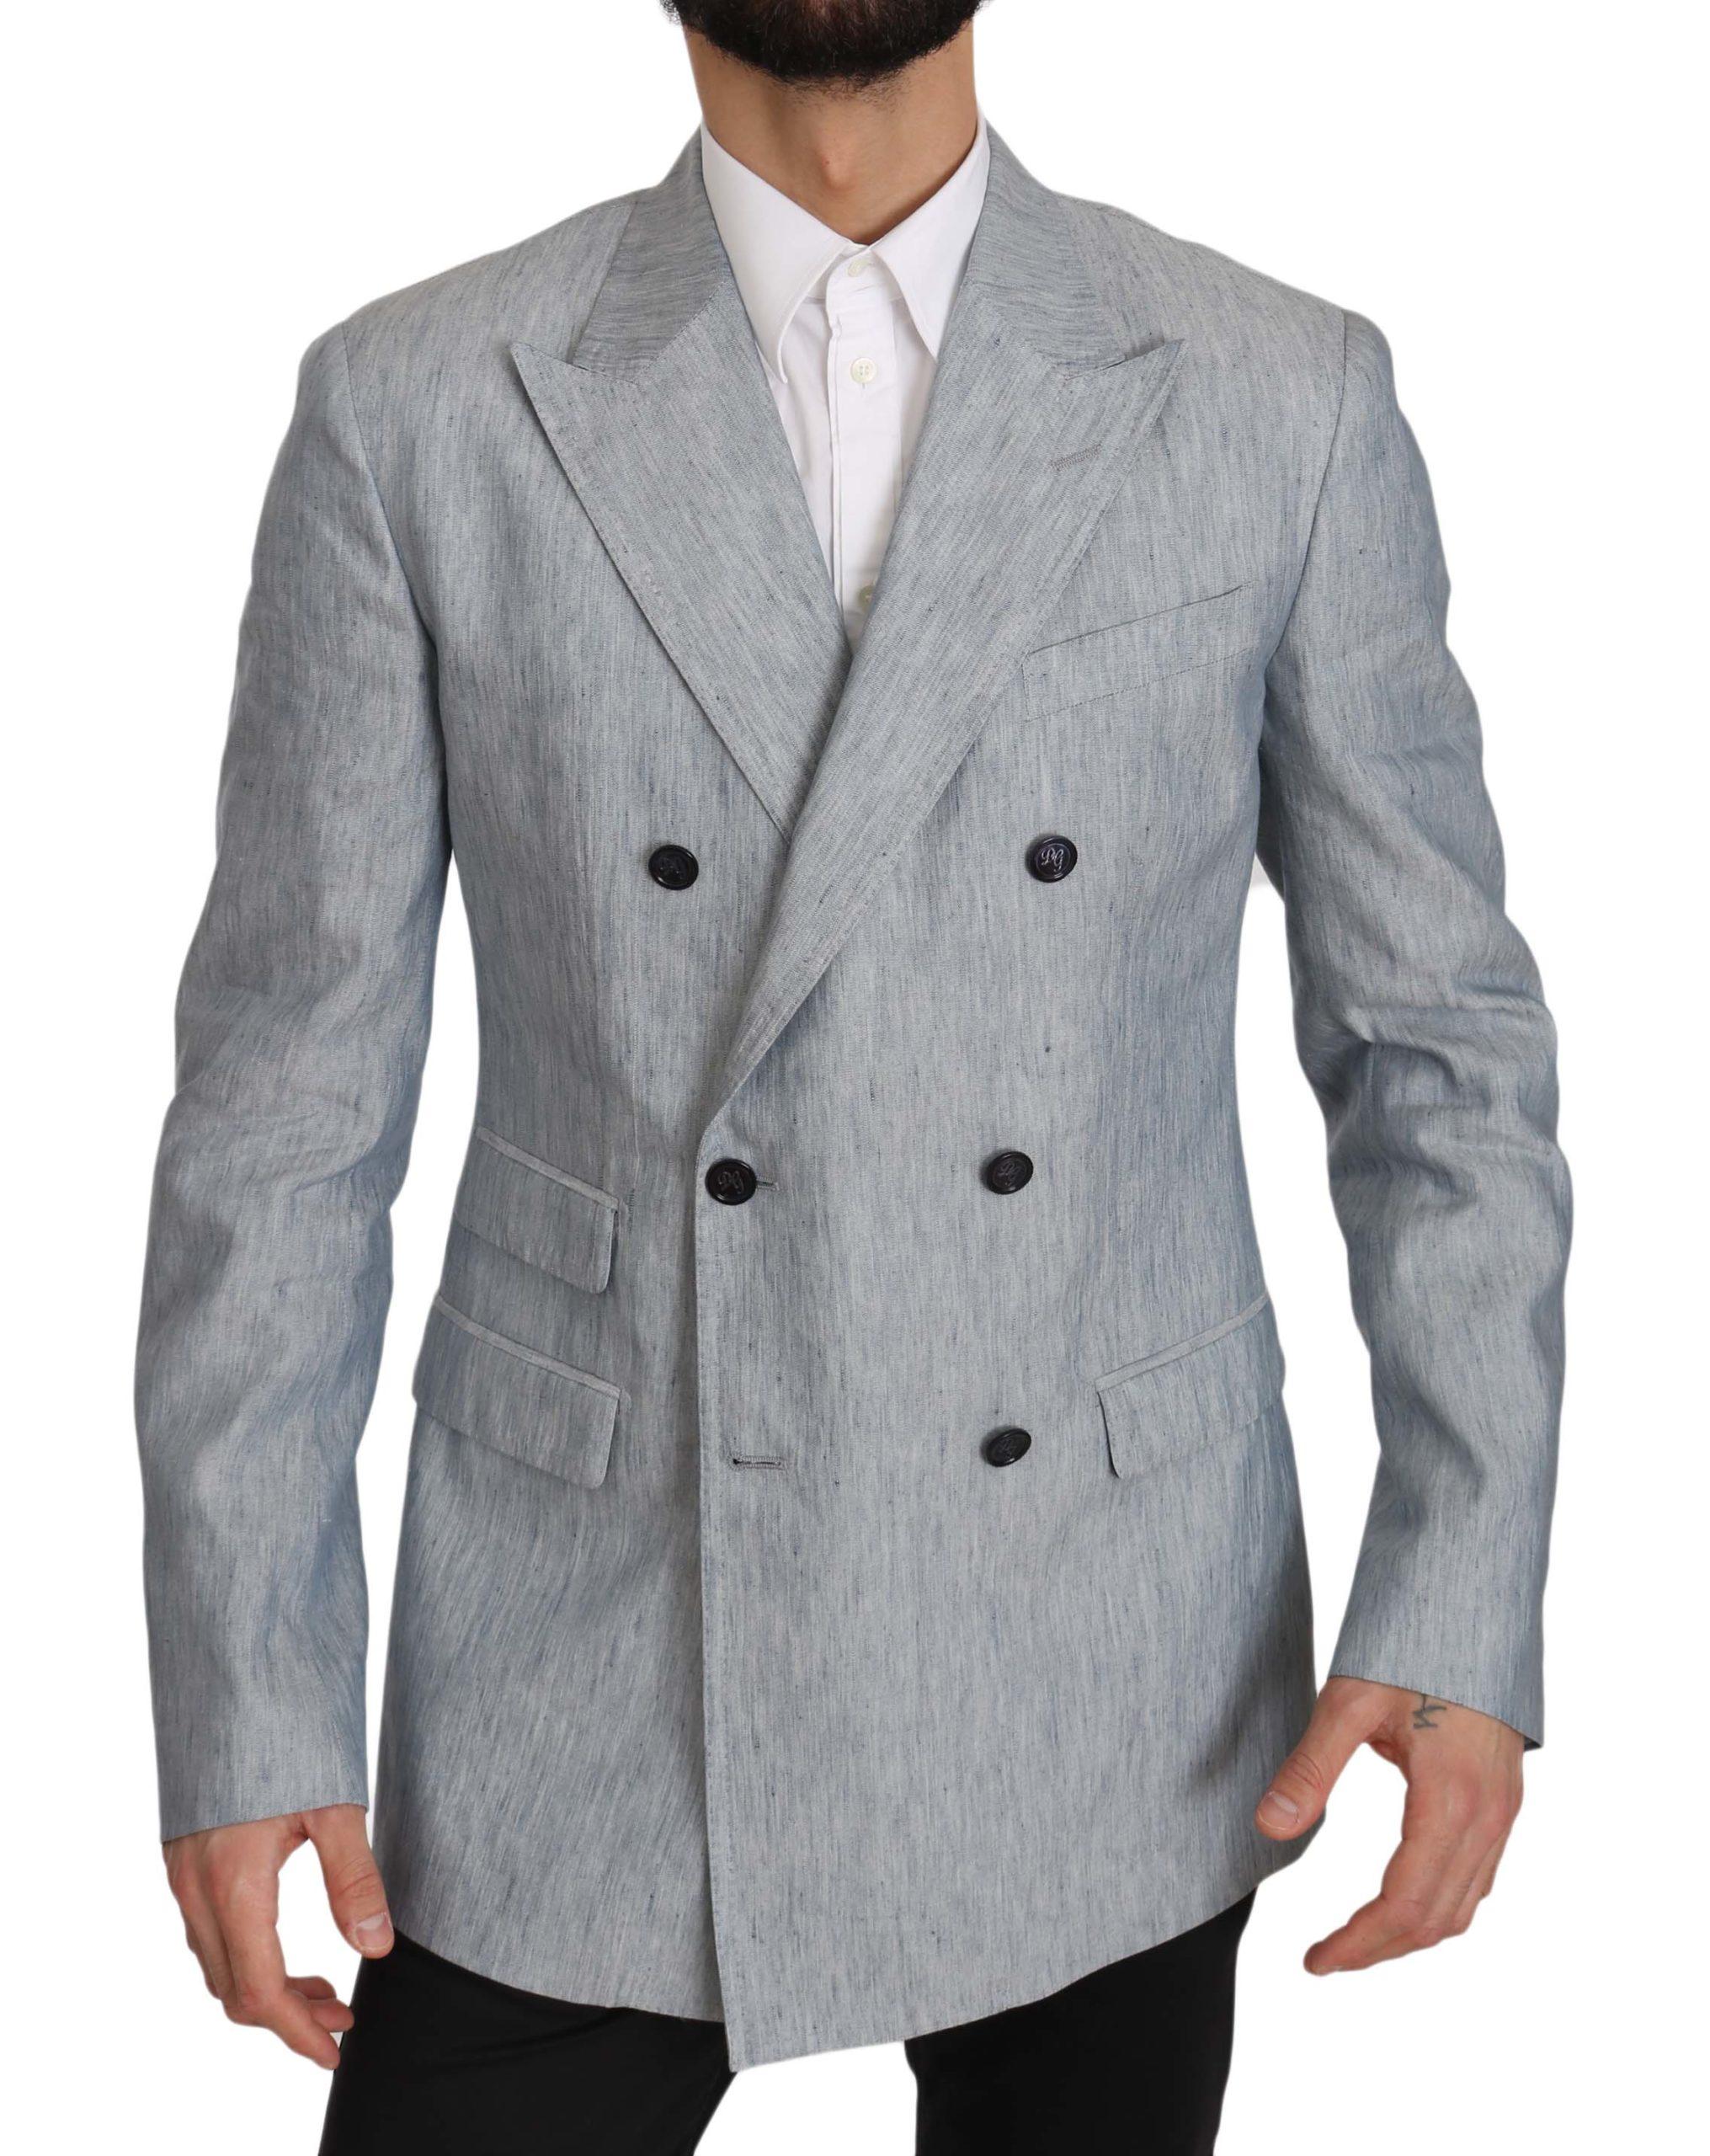 Dolce & Gabbana Men's Blazer Blue JKT2368 - IT48 | M